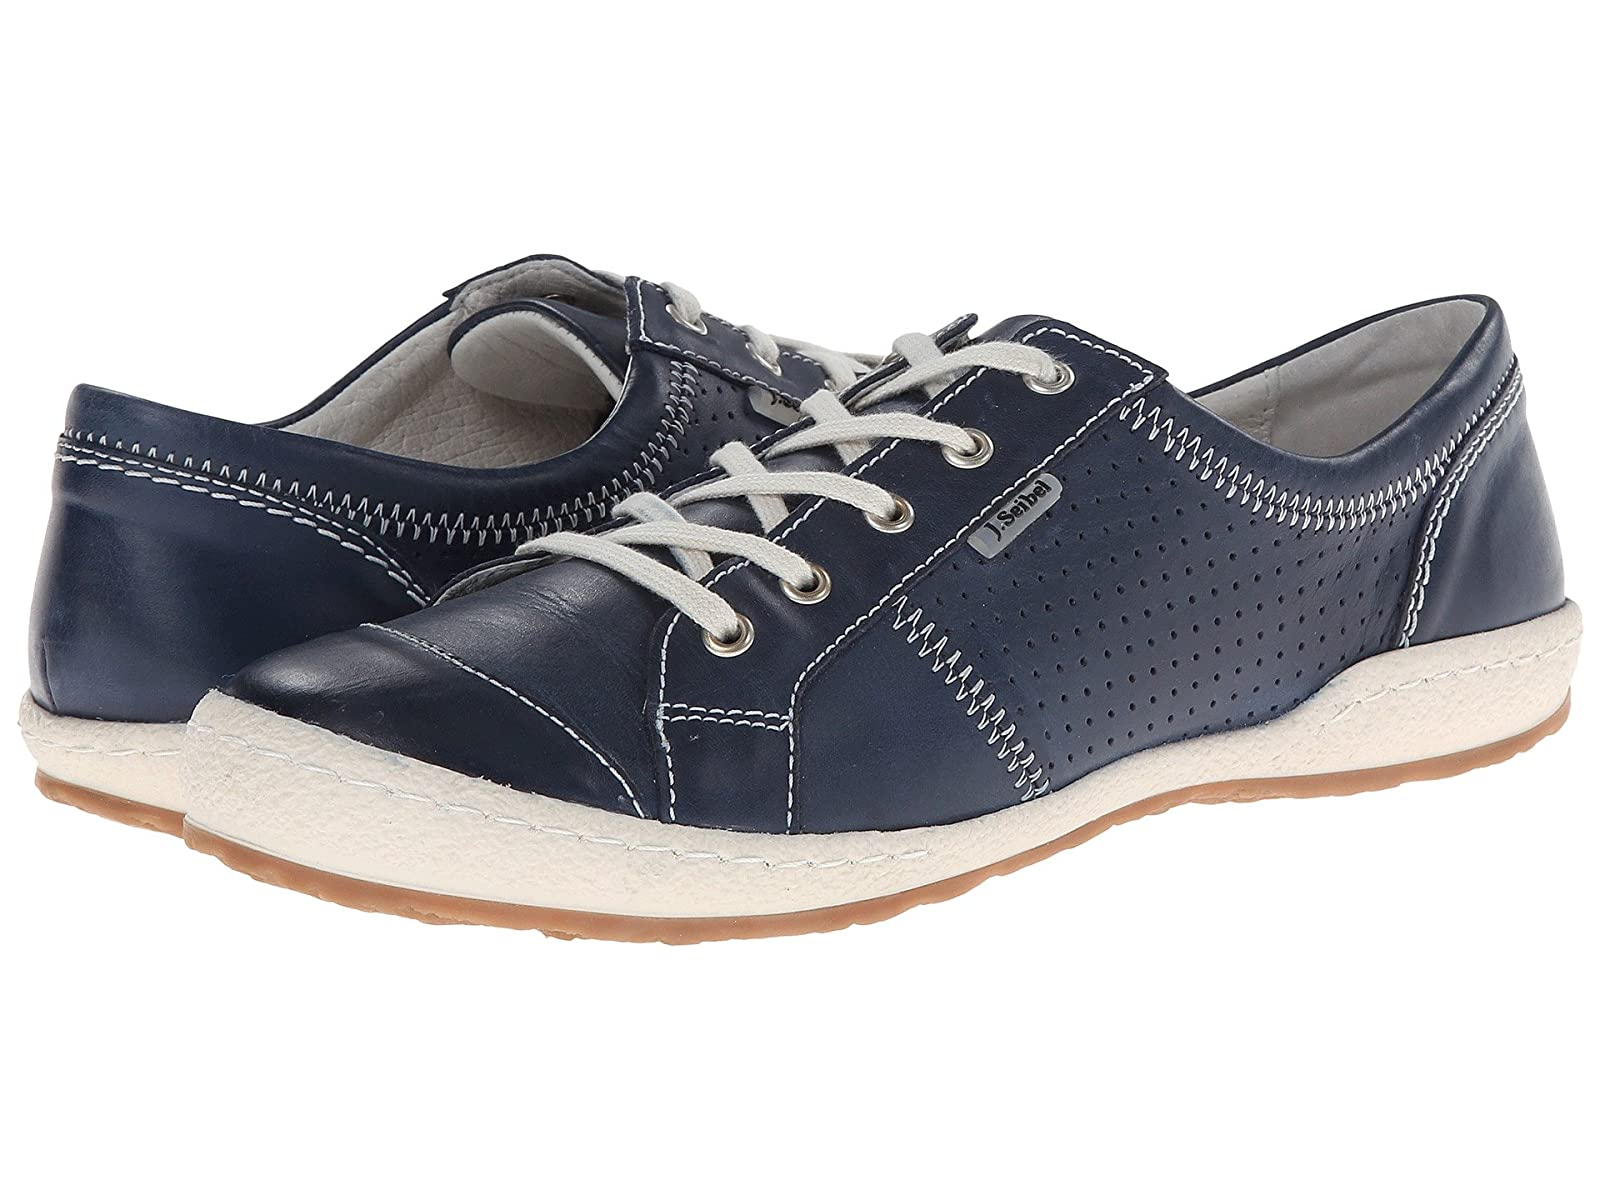 Josef Seibel CaspianAtmospheric grades have affordable shoes